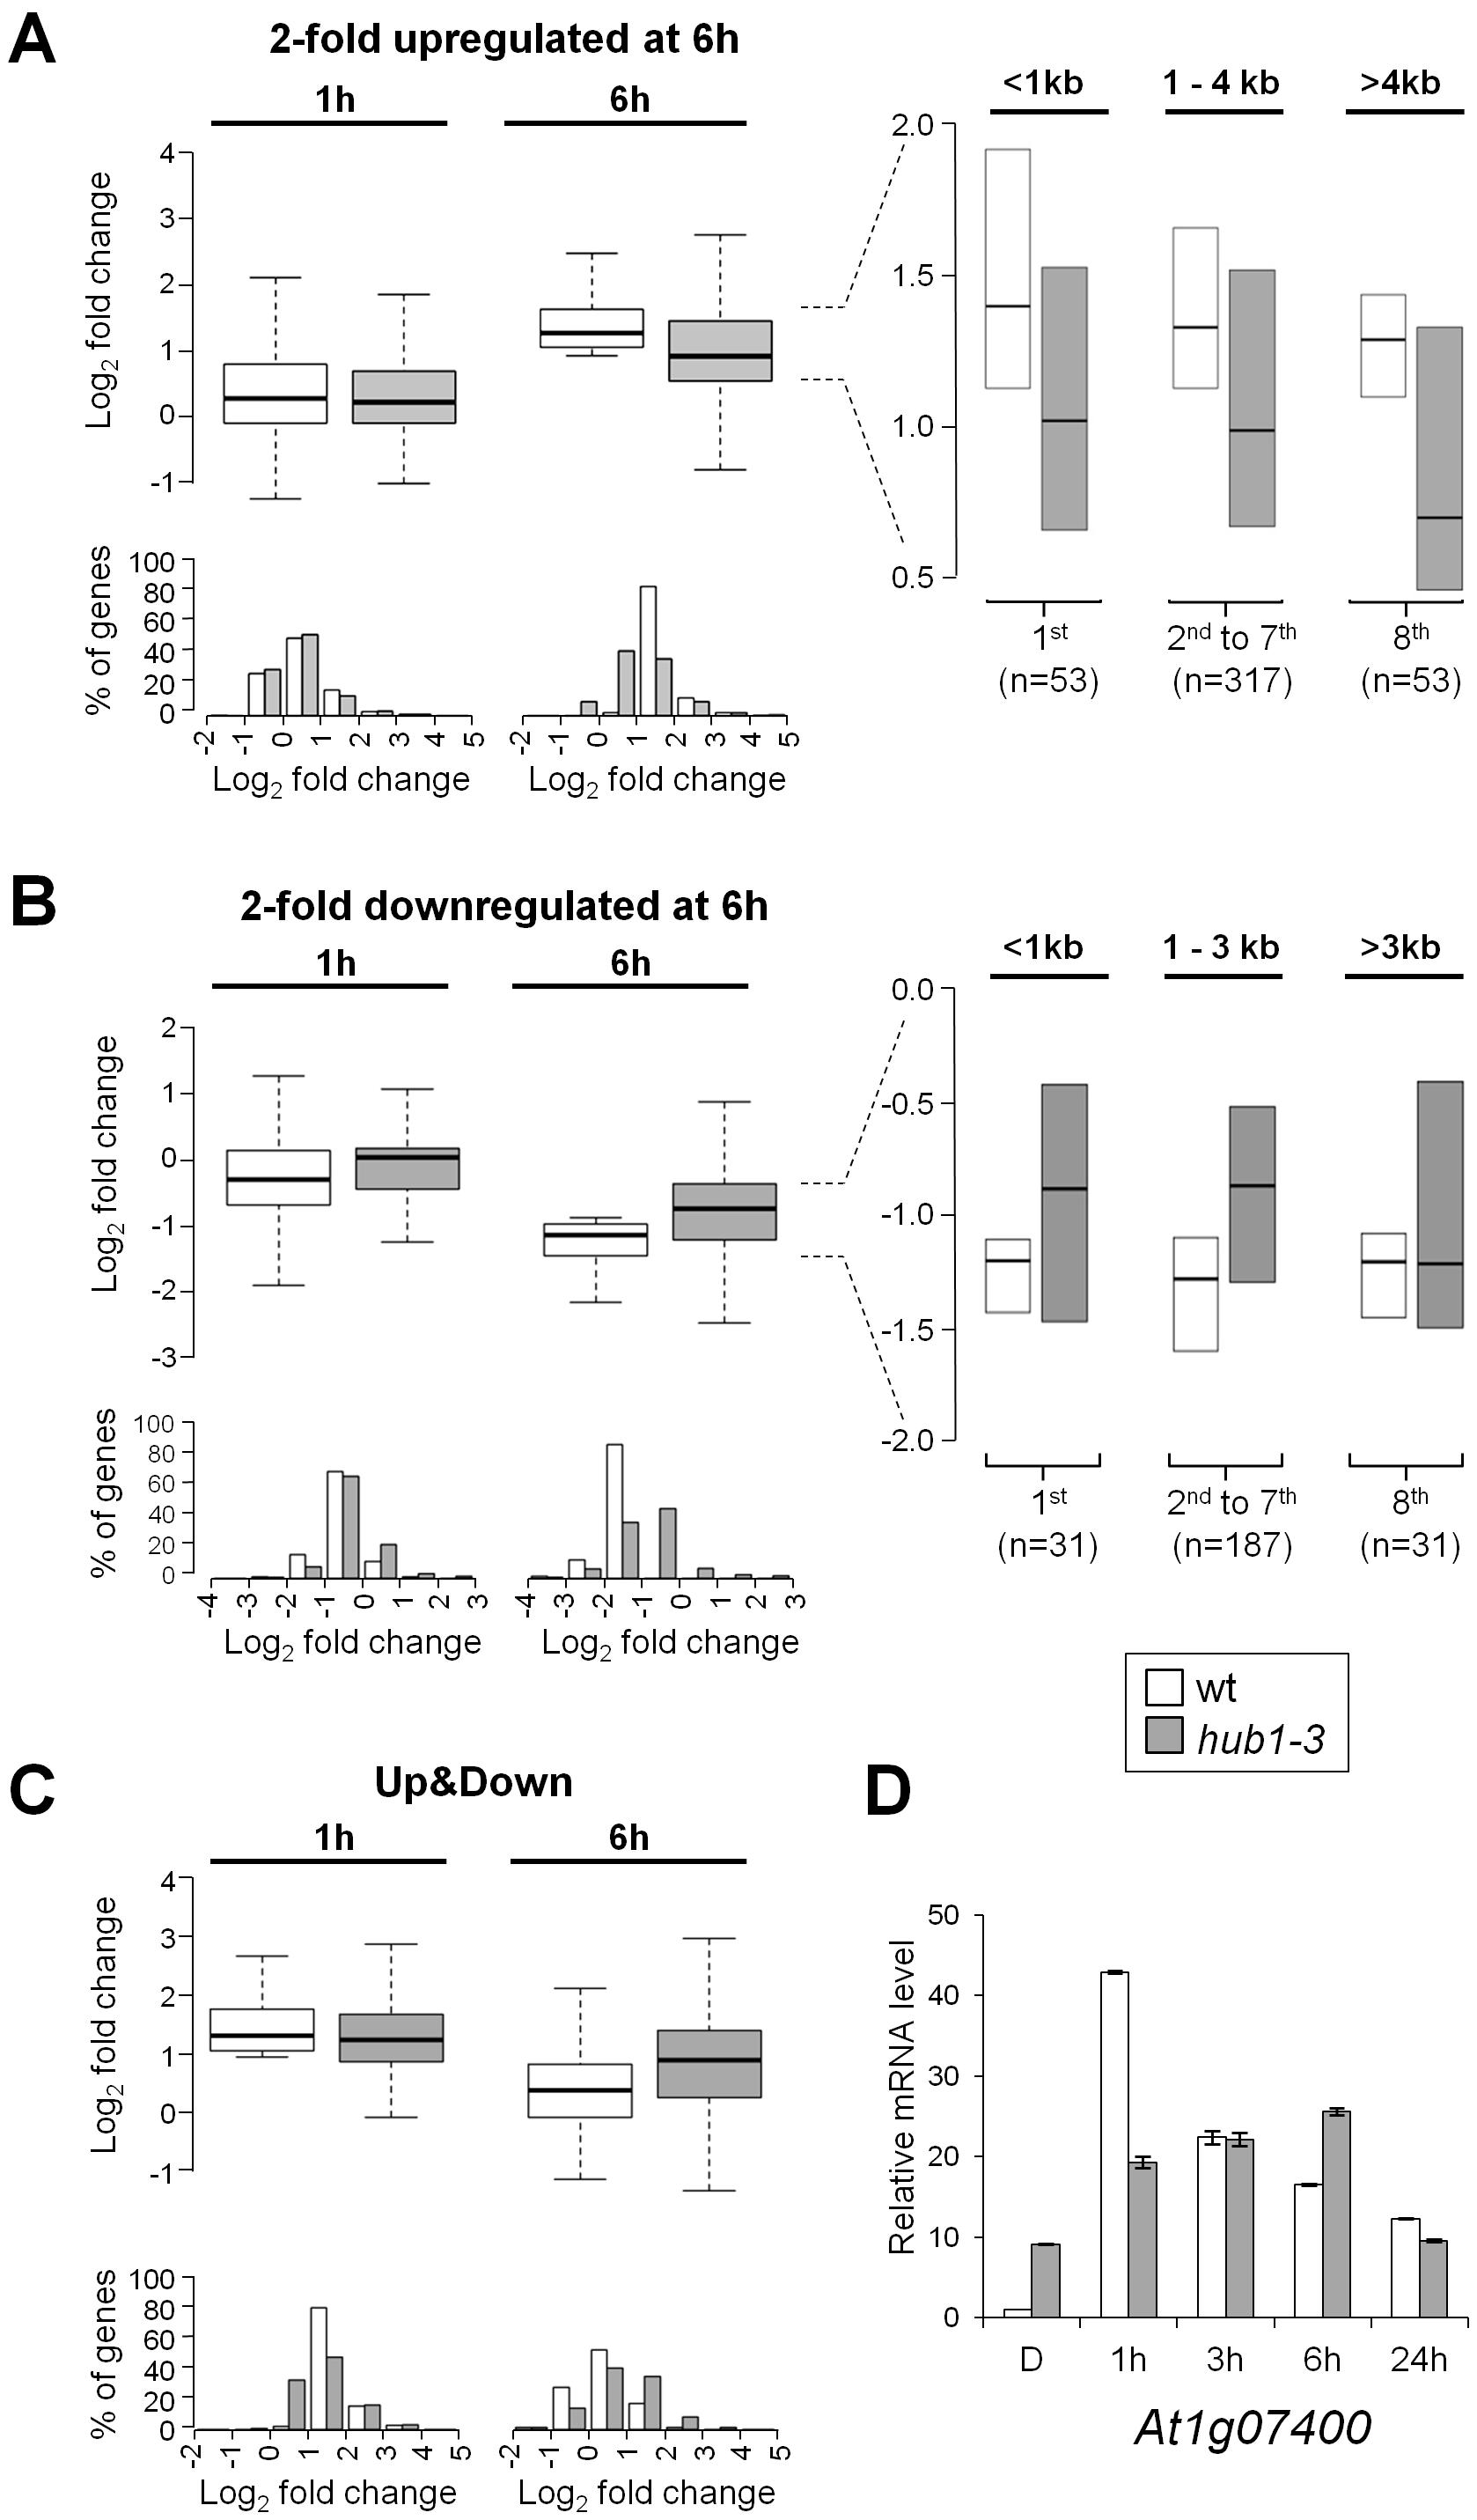 Expression kinetics of light-regulated genes are defective in <i>hub1-3</i> mutant seedlings.